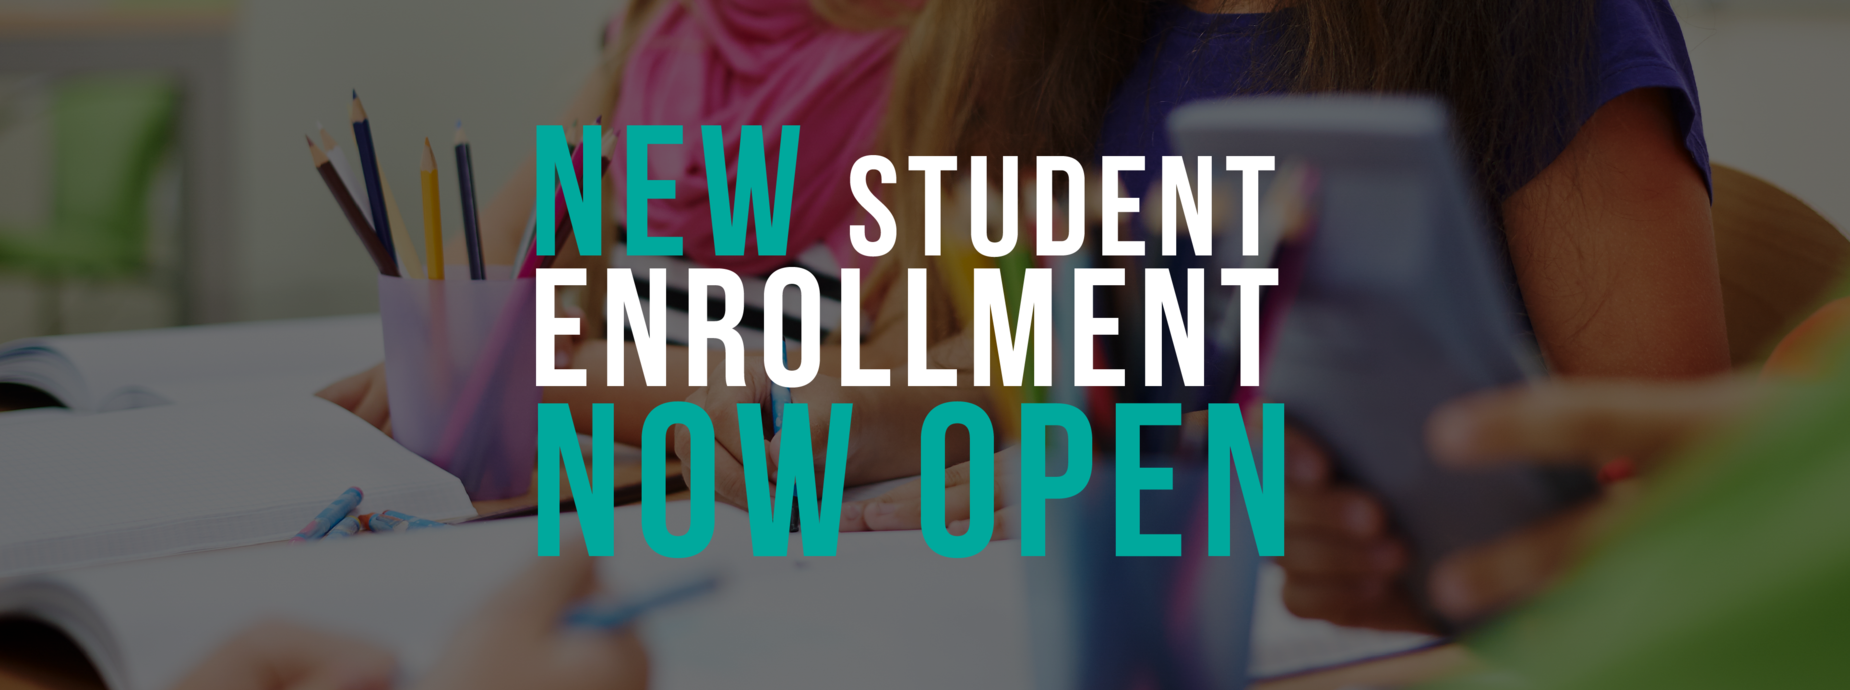 New Student Enrollment Now Open